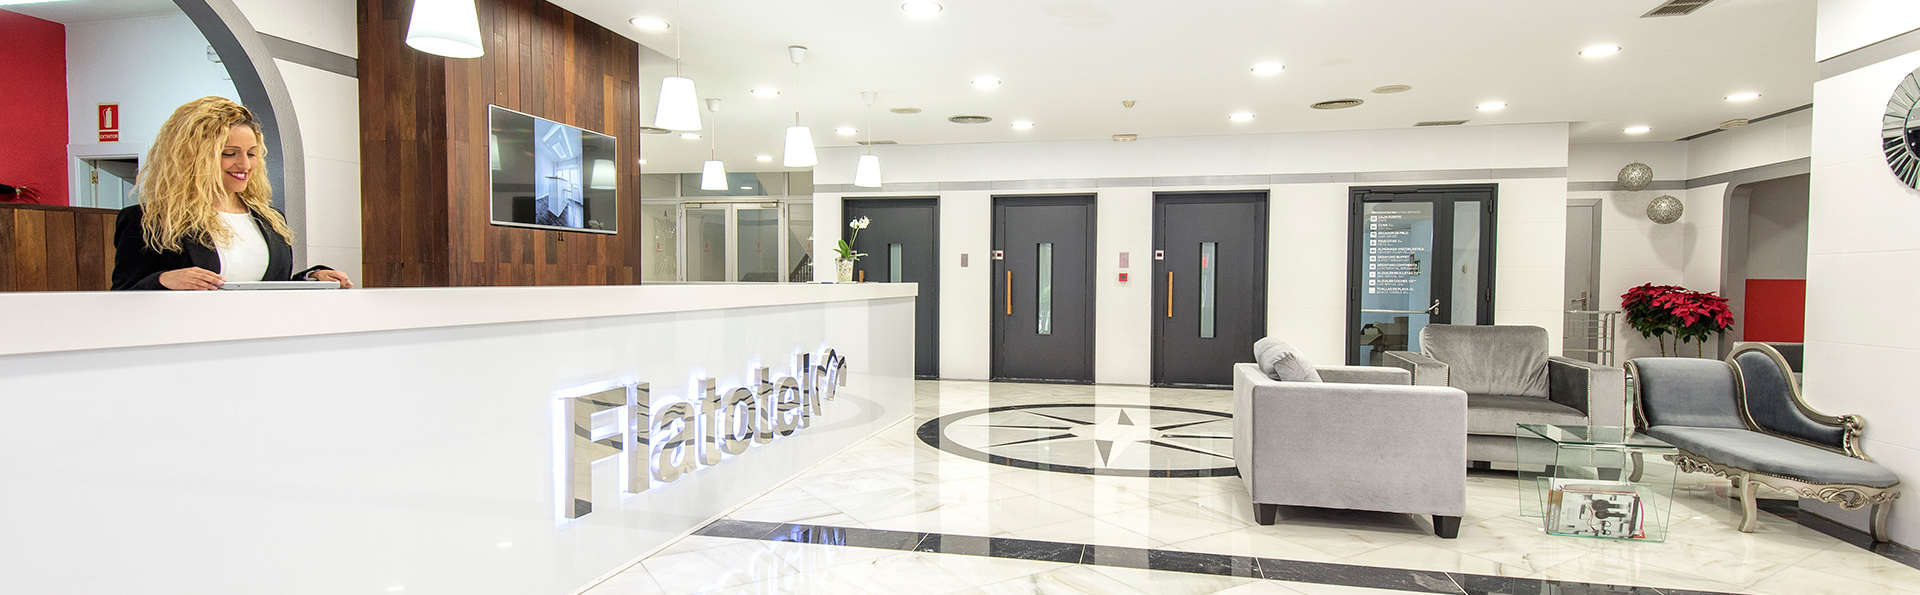 First Flatotel Apartments - EDIT_reception.jpg